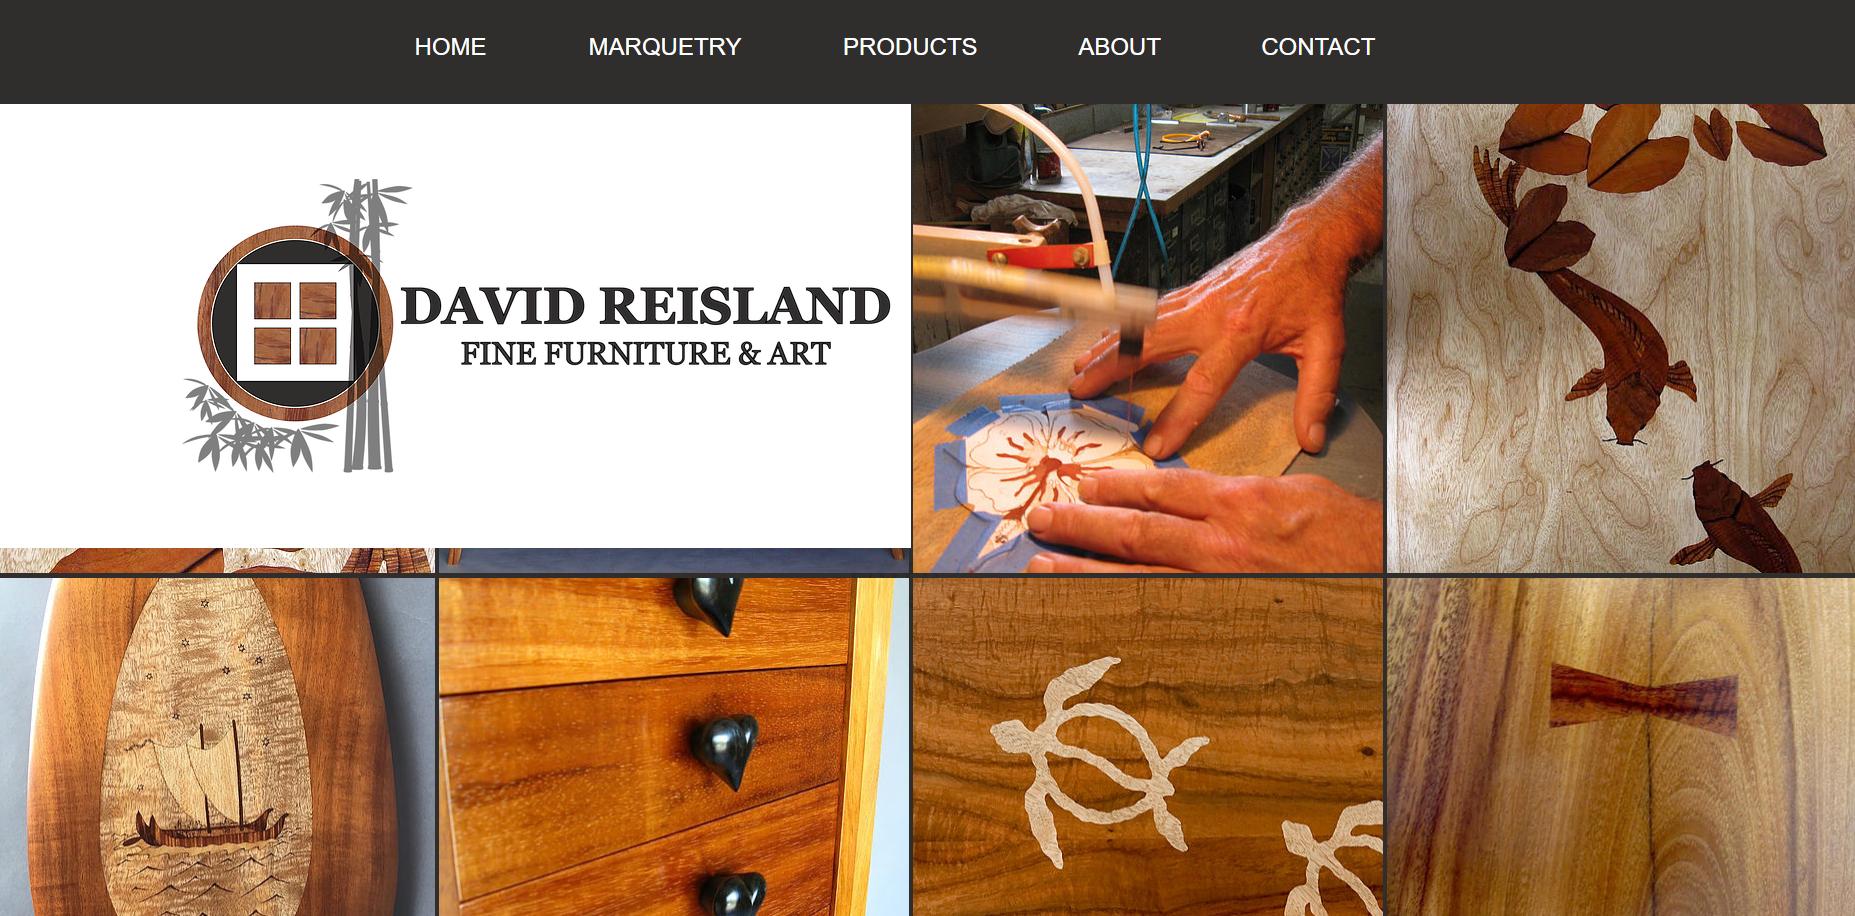 davidreisland.com